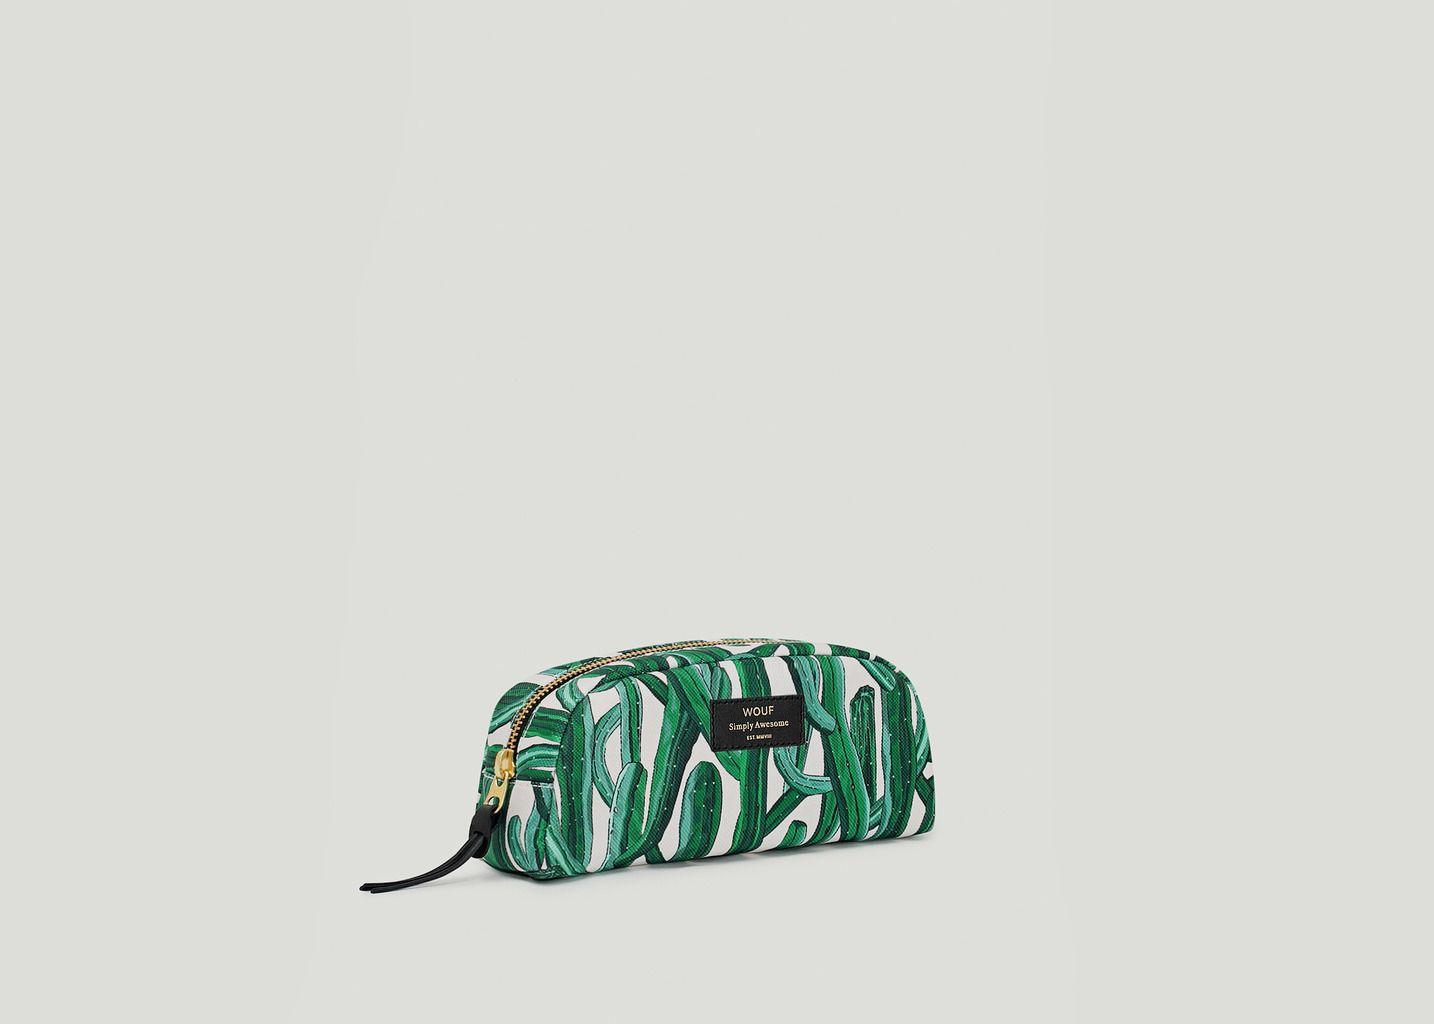 Petite Trousse Wild Cactus - Wouf